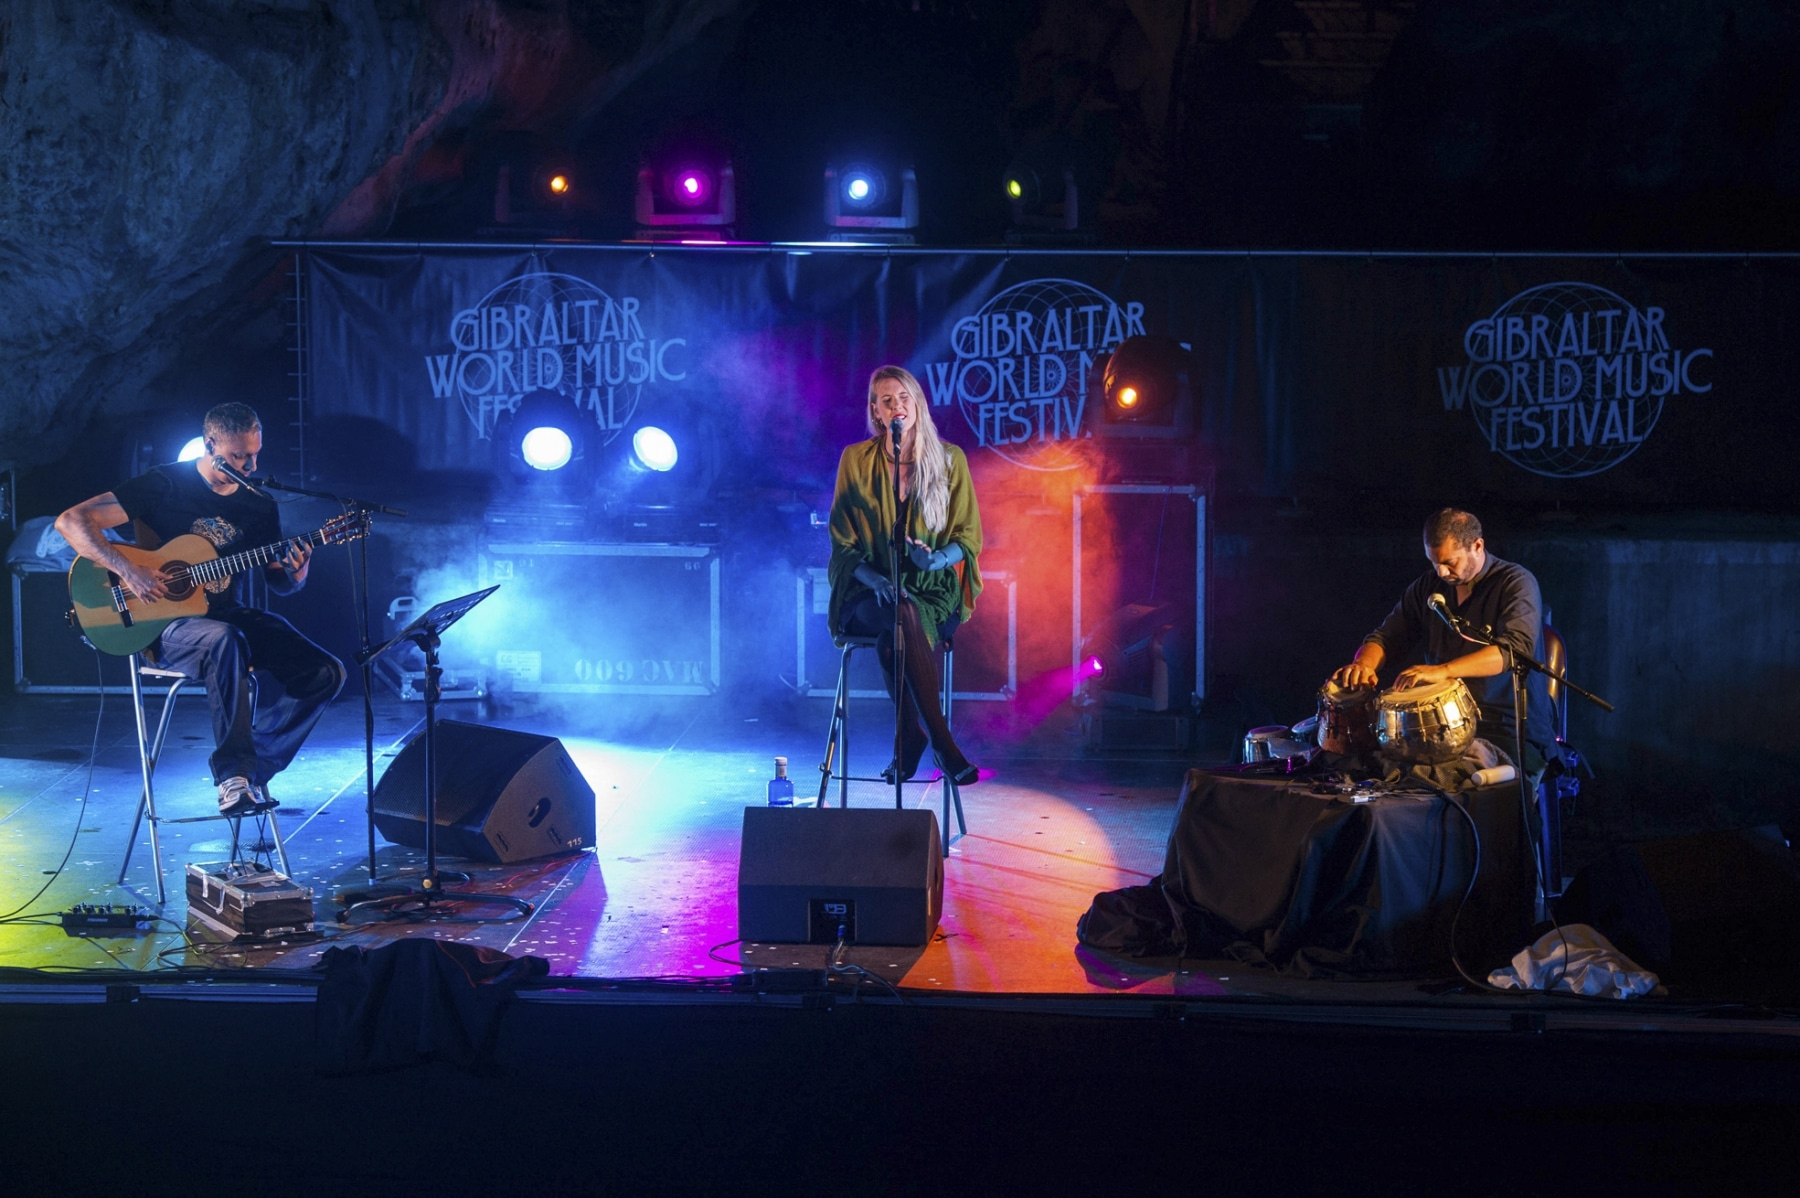 19-junio-gibraltar-world-music-festival46_14277912360_o